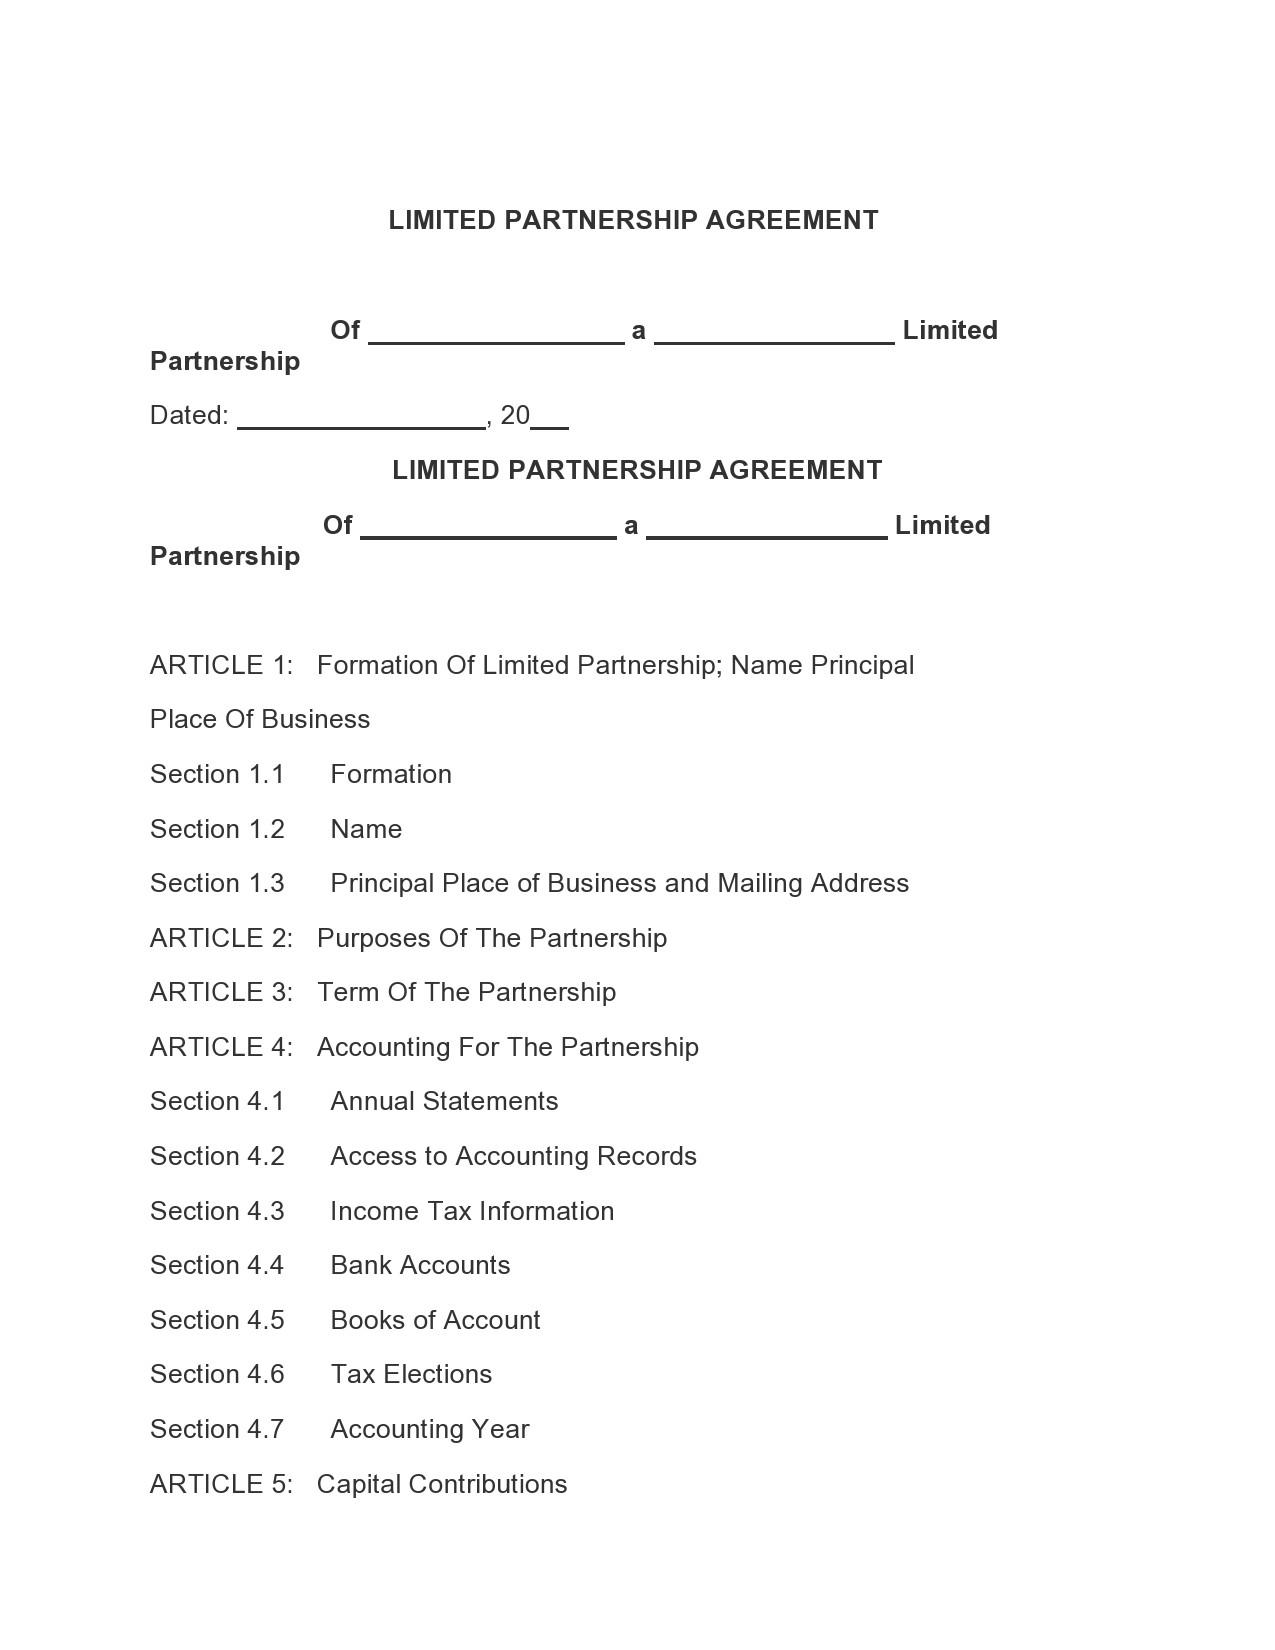 Free limited partnership agreement 09